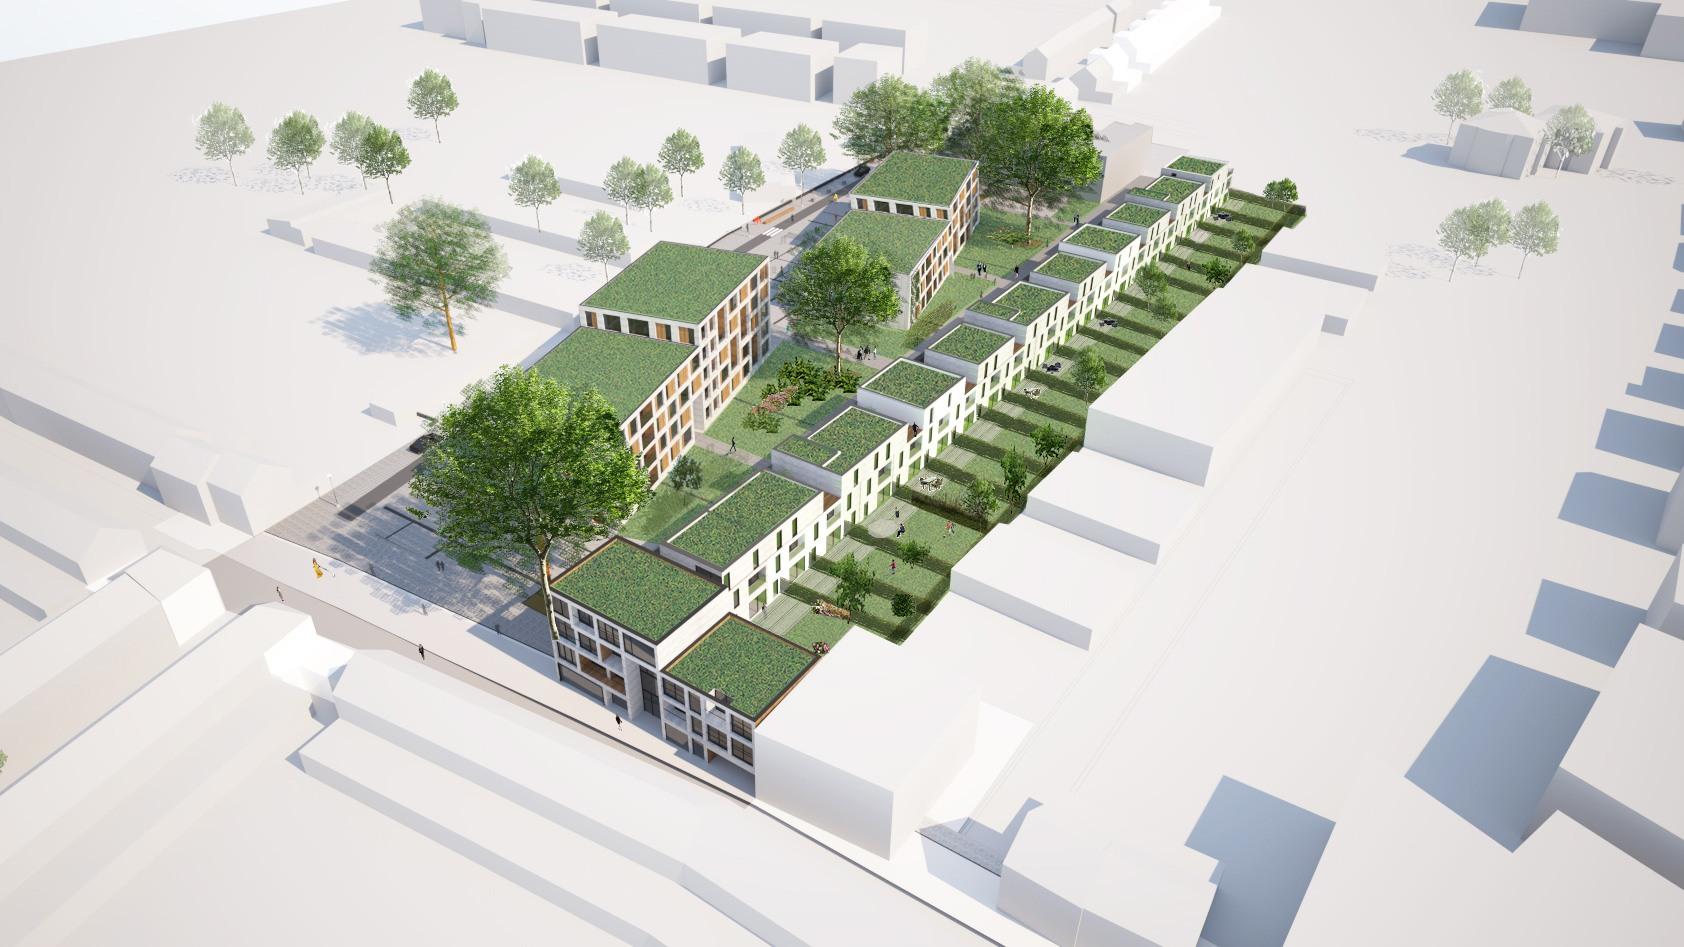 Splichal ovg architecten for Grondplannen woningen